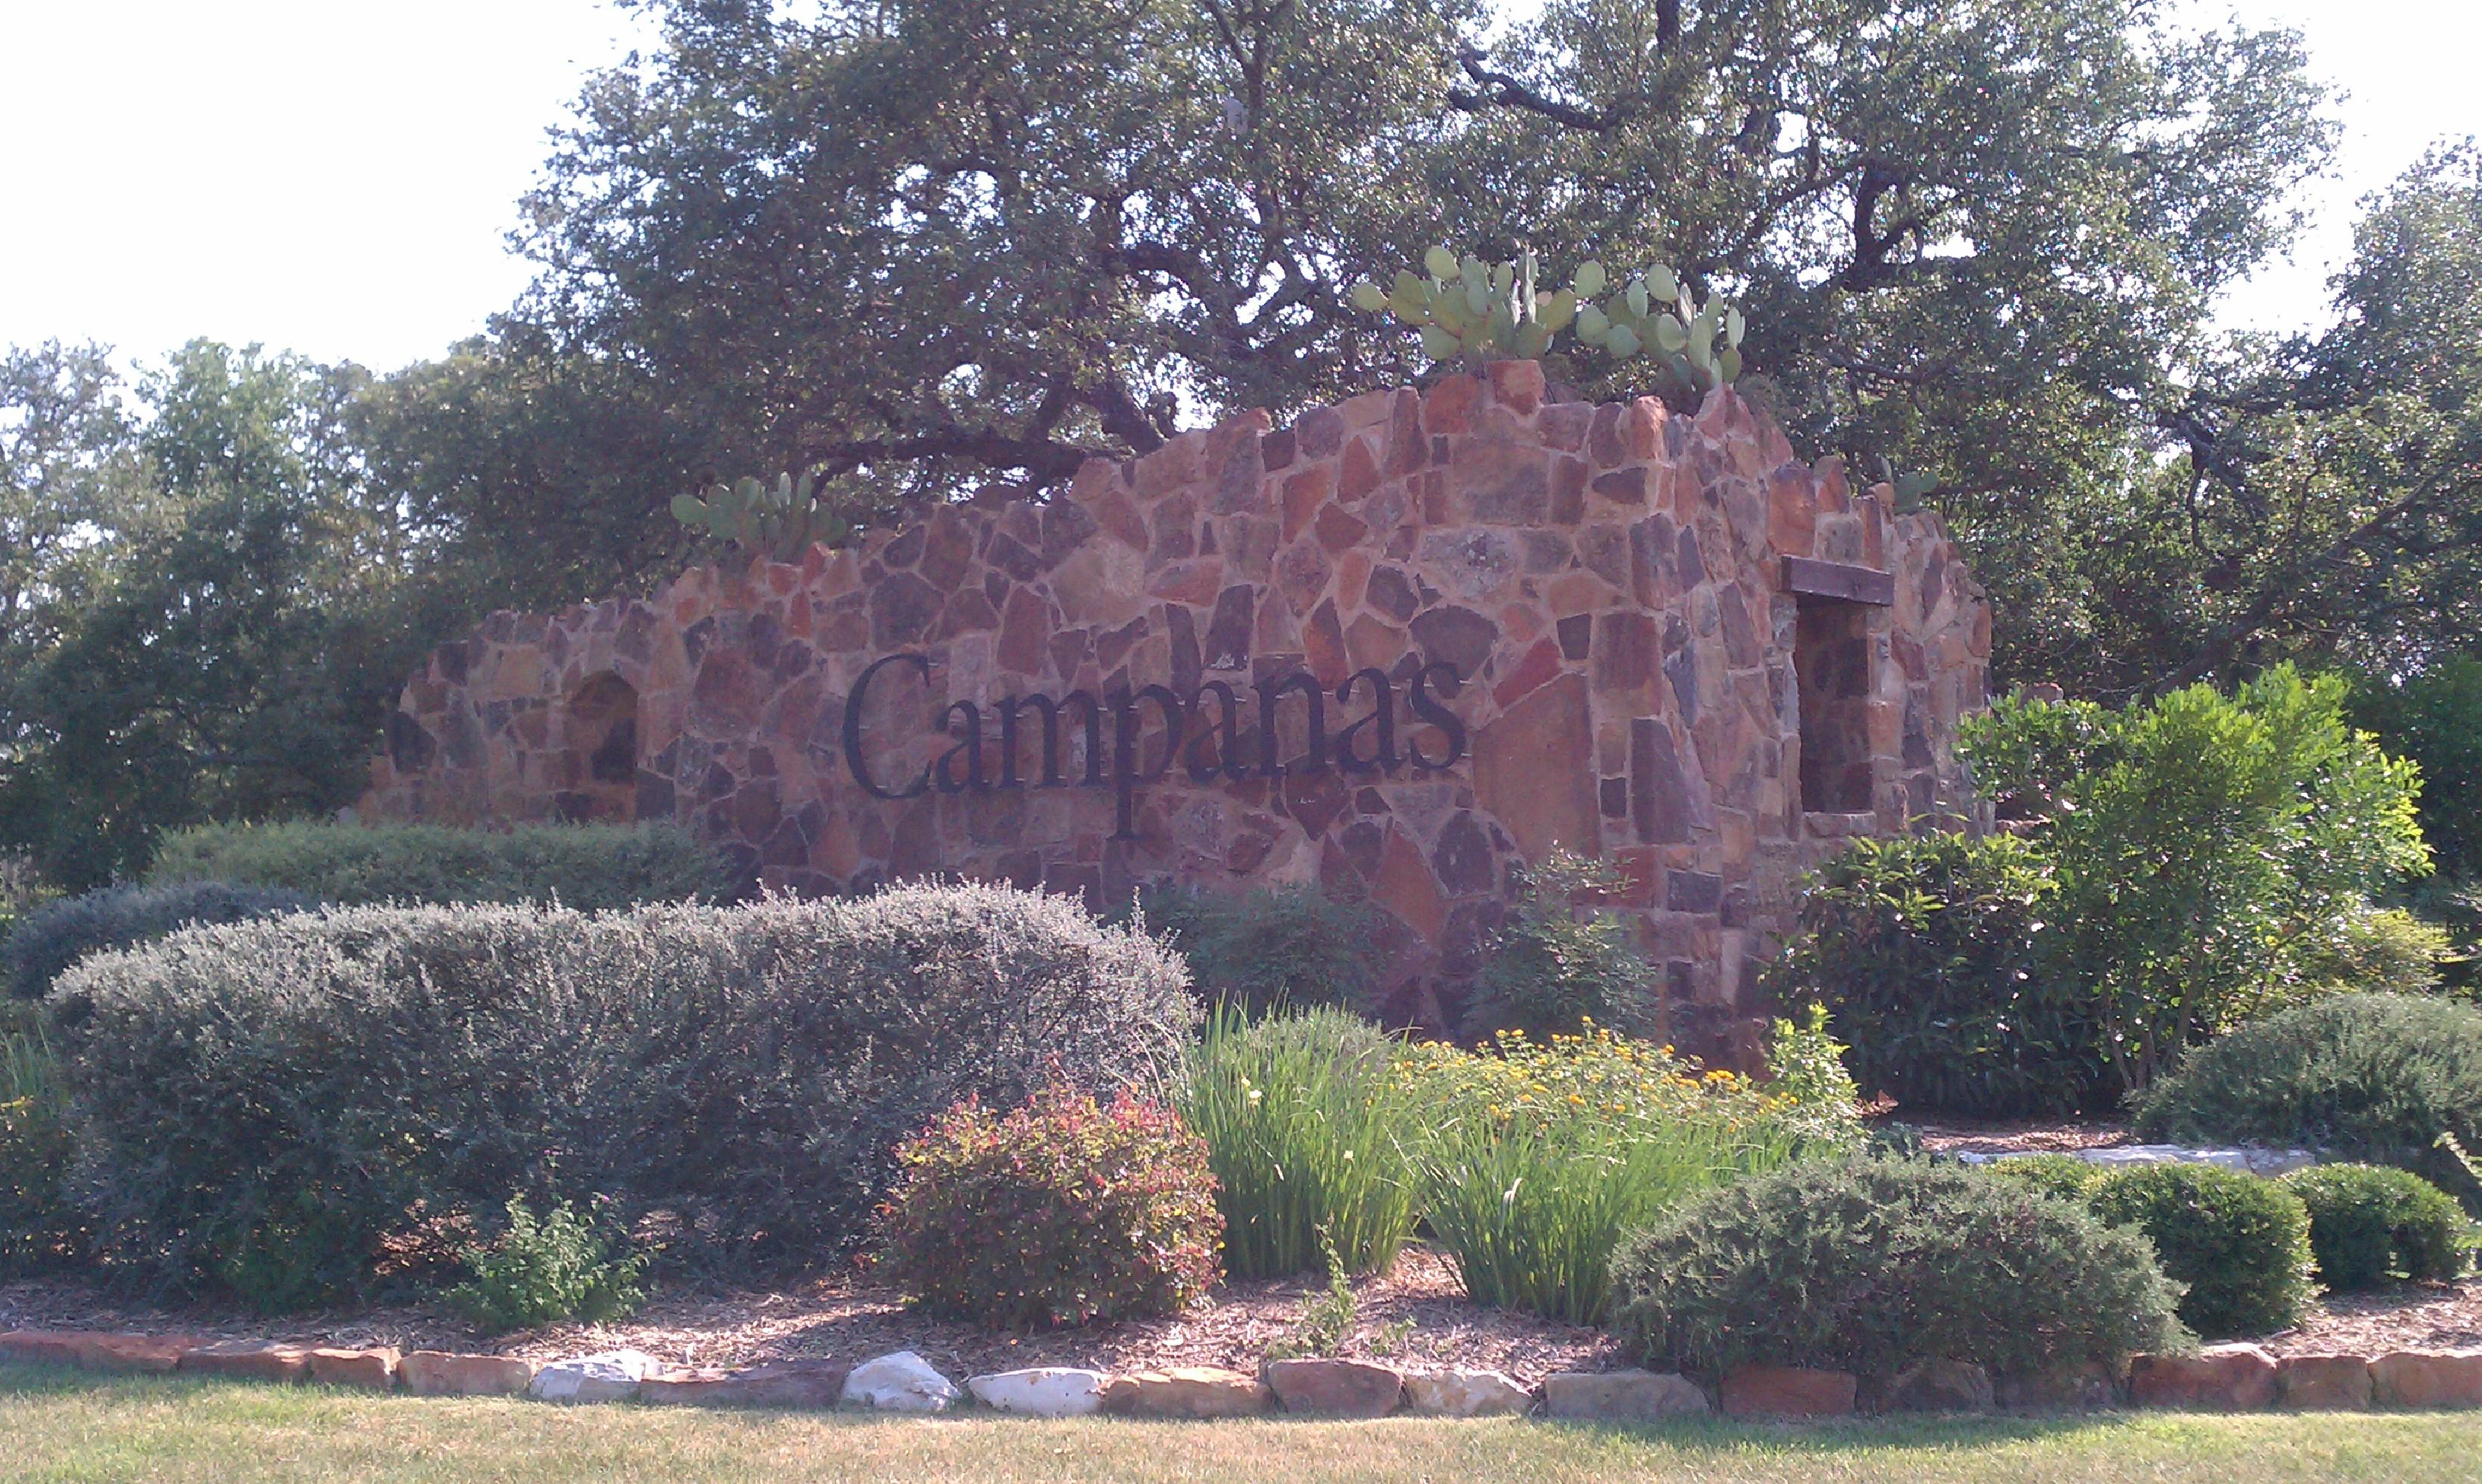 Cibolo Canyons - Campanas by Sitterle Homes - Stone Oak & North San Antonio / TPC Community Spotlight